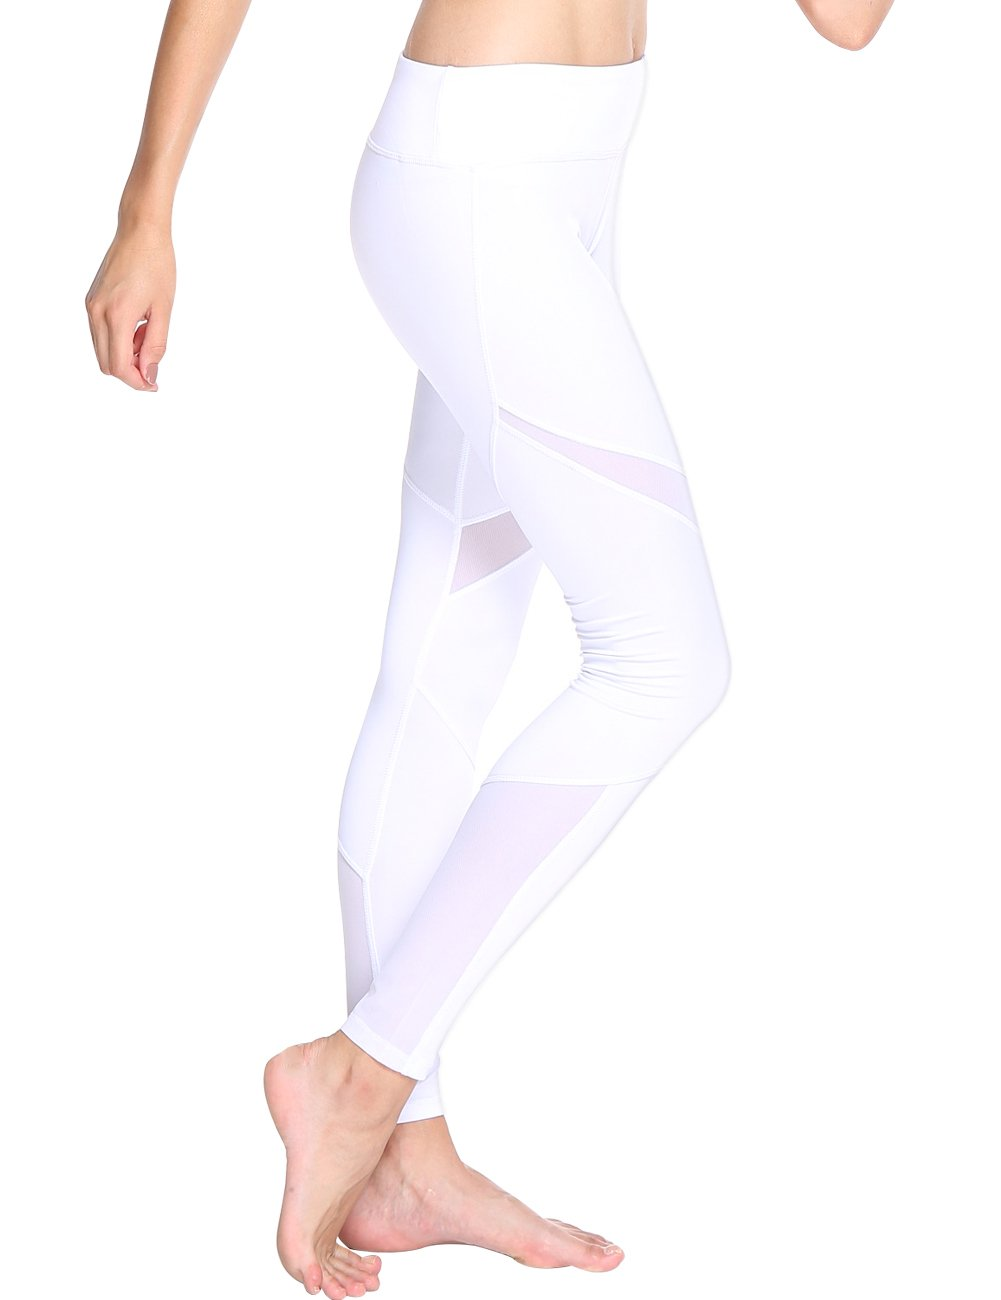 OVESPORT Women Sports Yoga Leggings Mesh, High Waisted Skinny Fitness Workout Pants(2069,White,M)